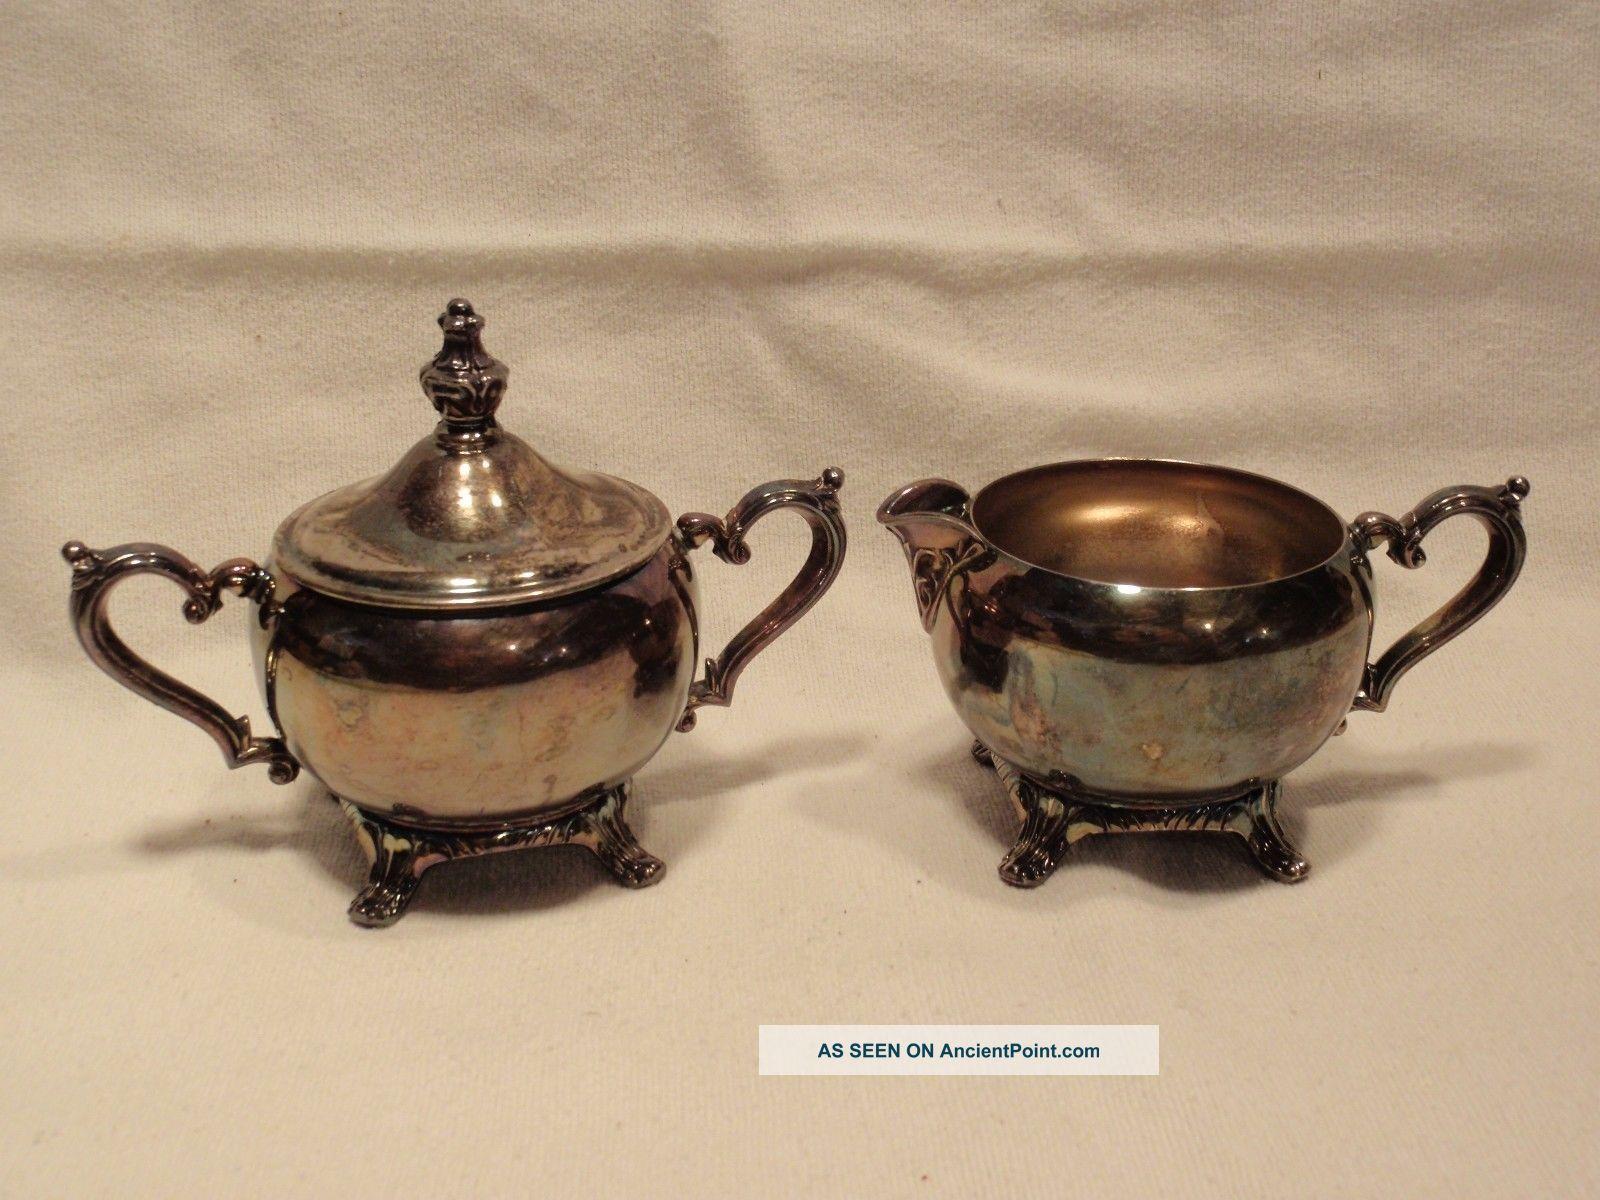 Vintage Wm Rogers Cream & Sugar Bowl Set Silver Plated. Creamers & Sugar Bowls photo